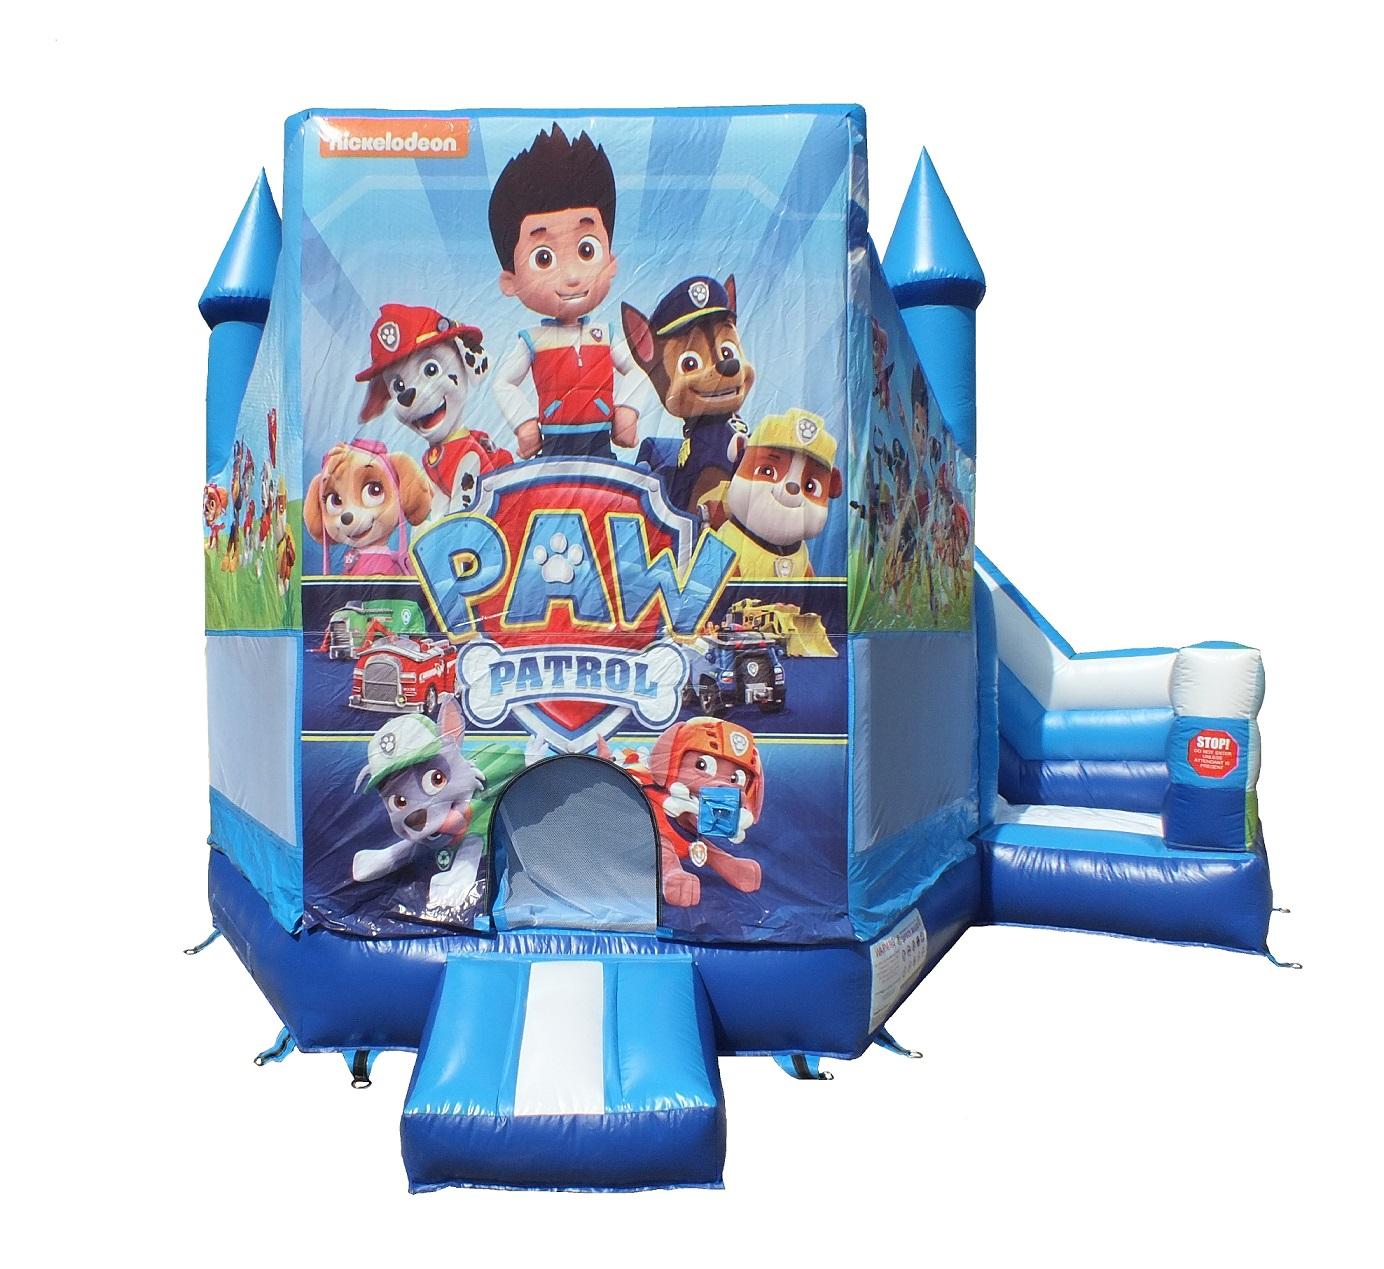 Paw Patrol Combo Bounce & Slide